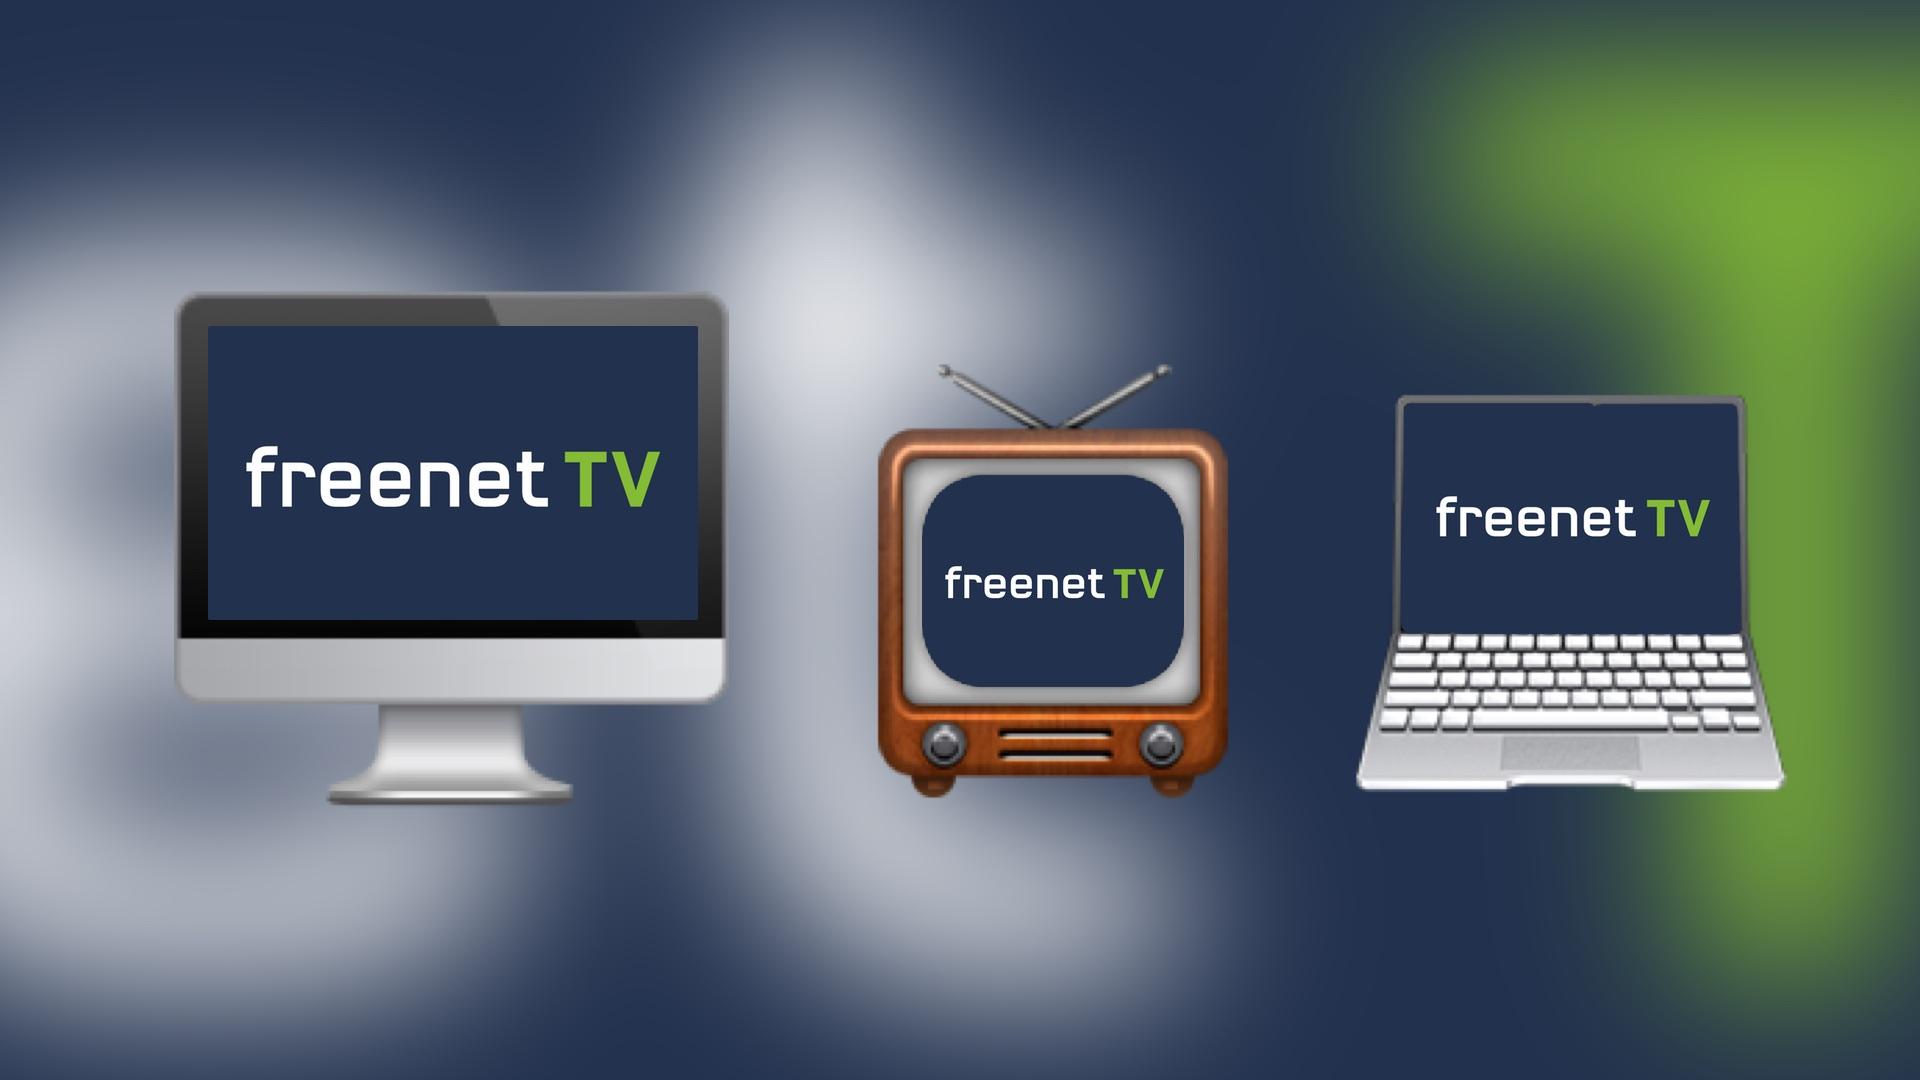 freenet tv kein signal